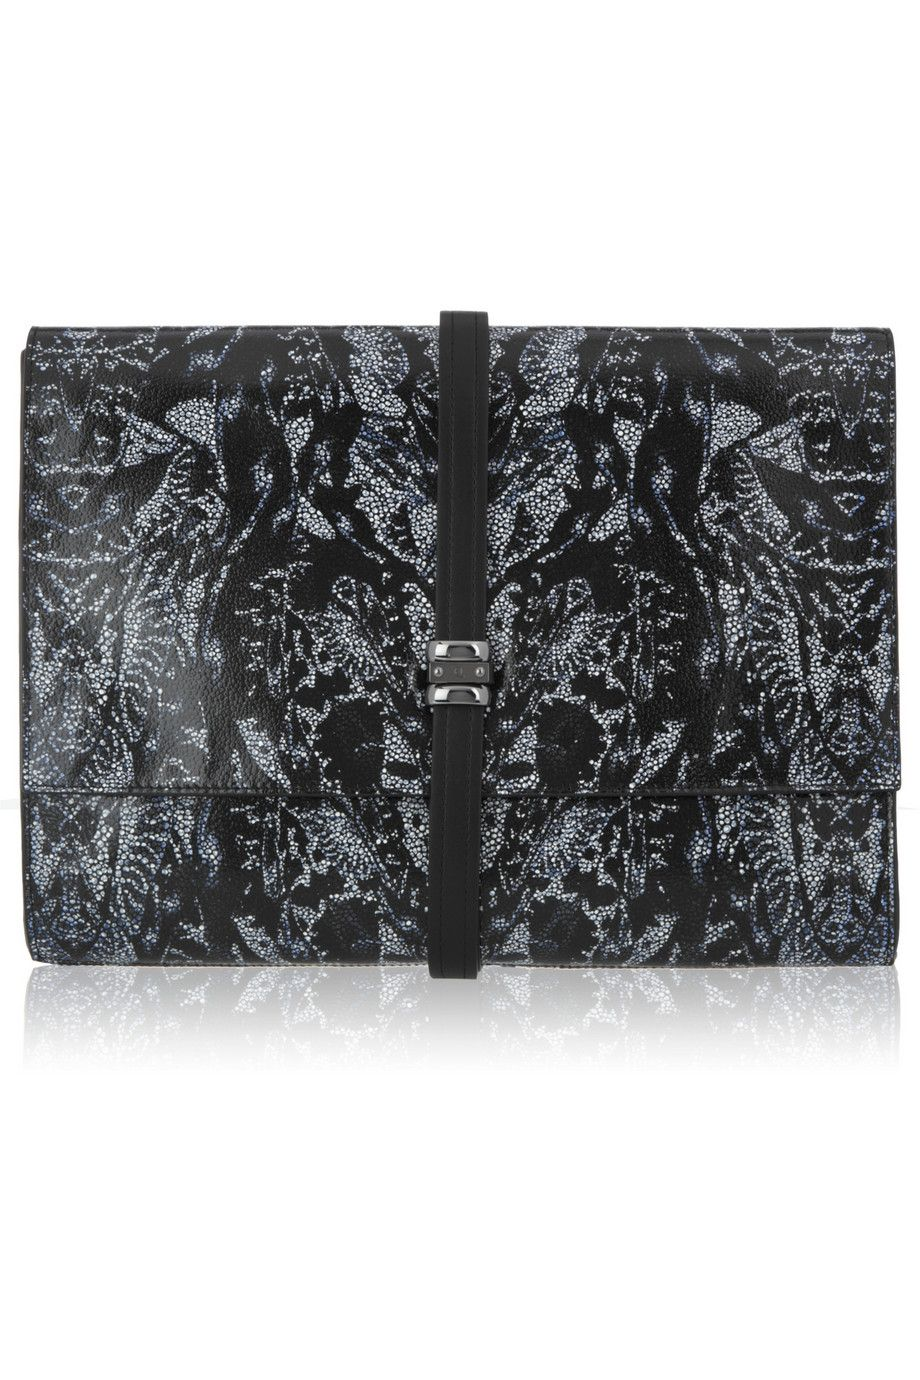 Alexander McQueen - leather clutch